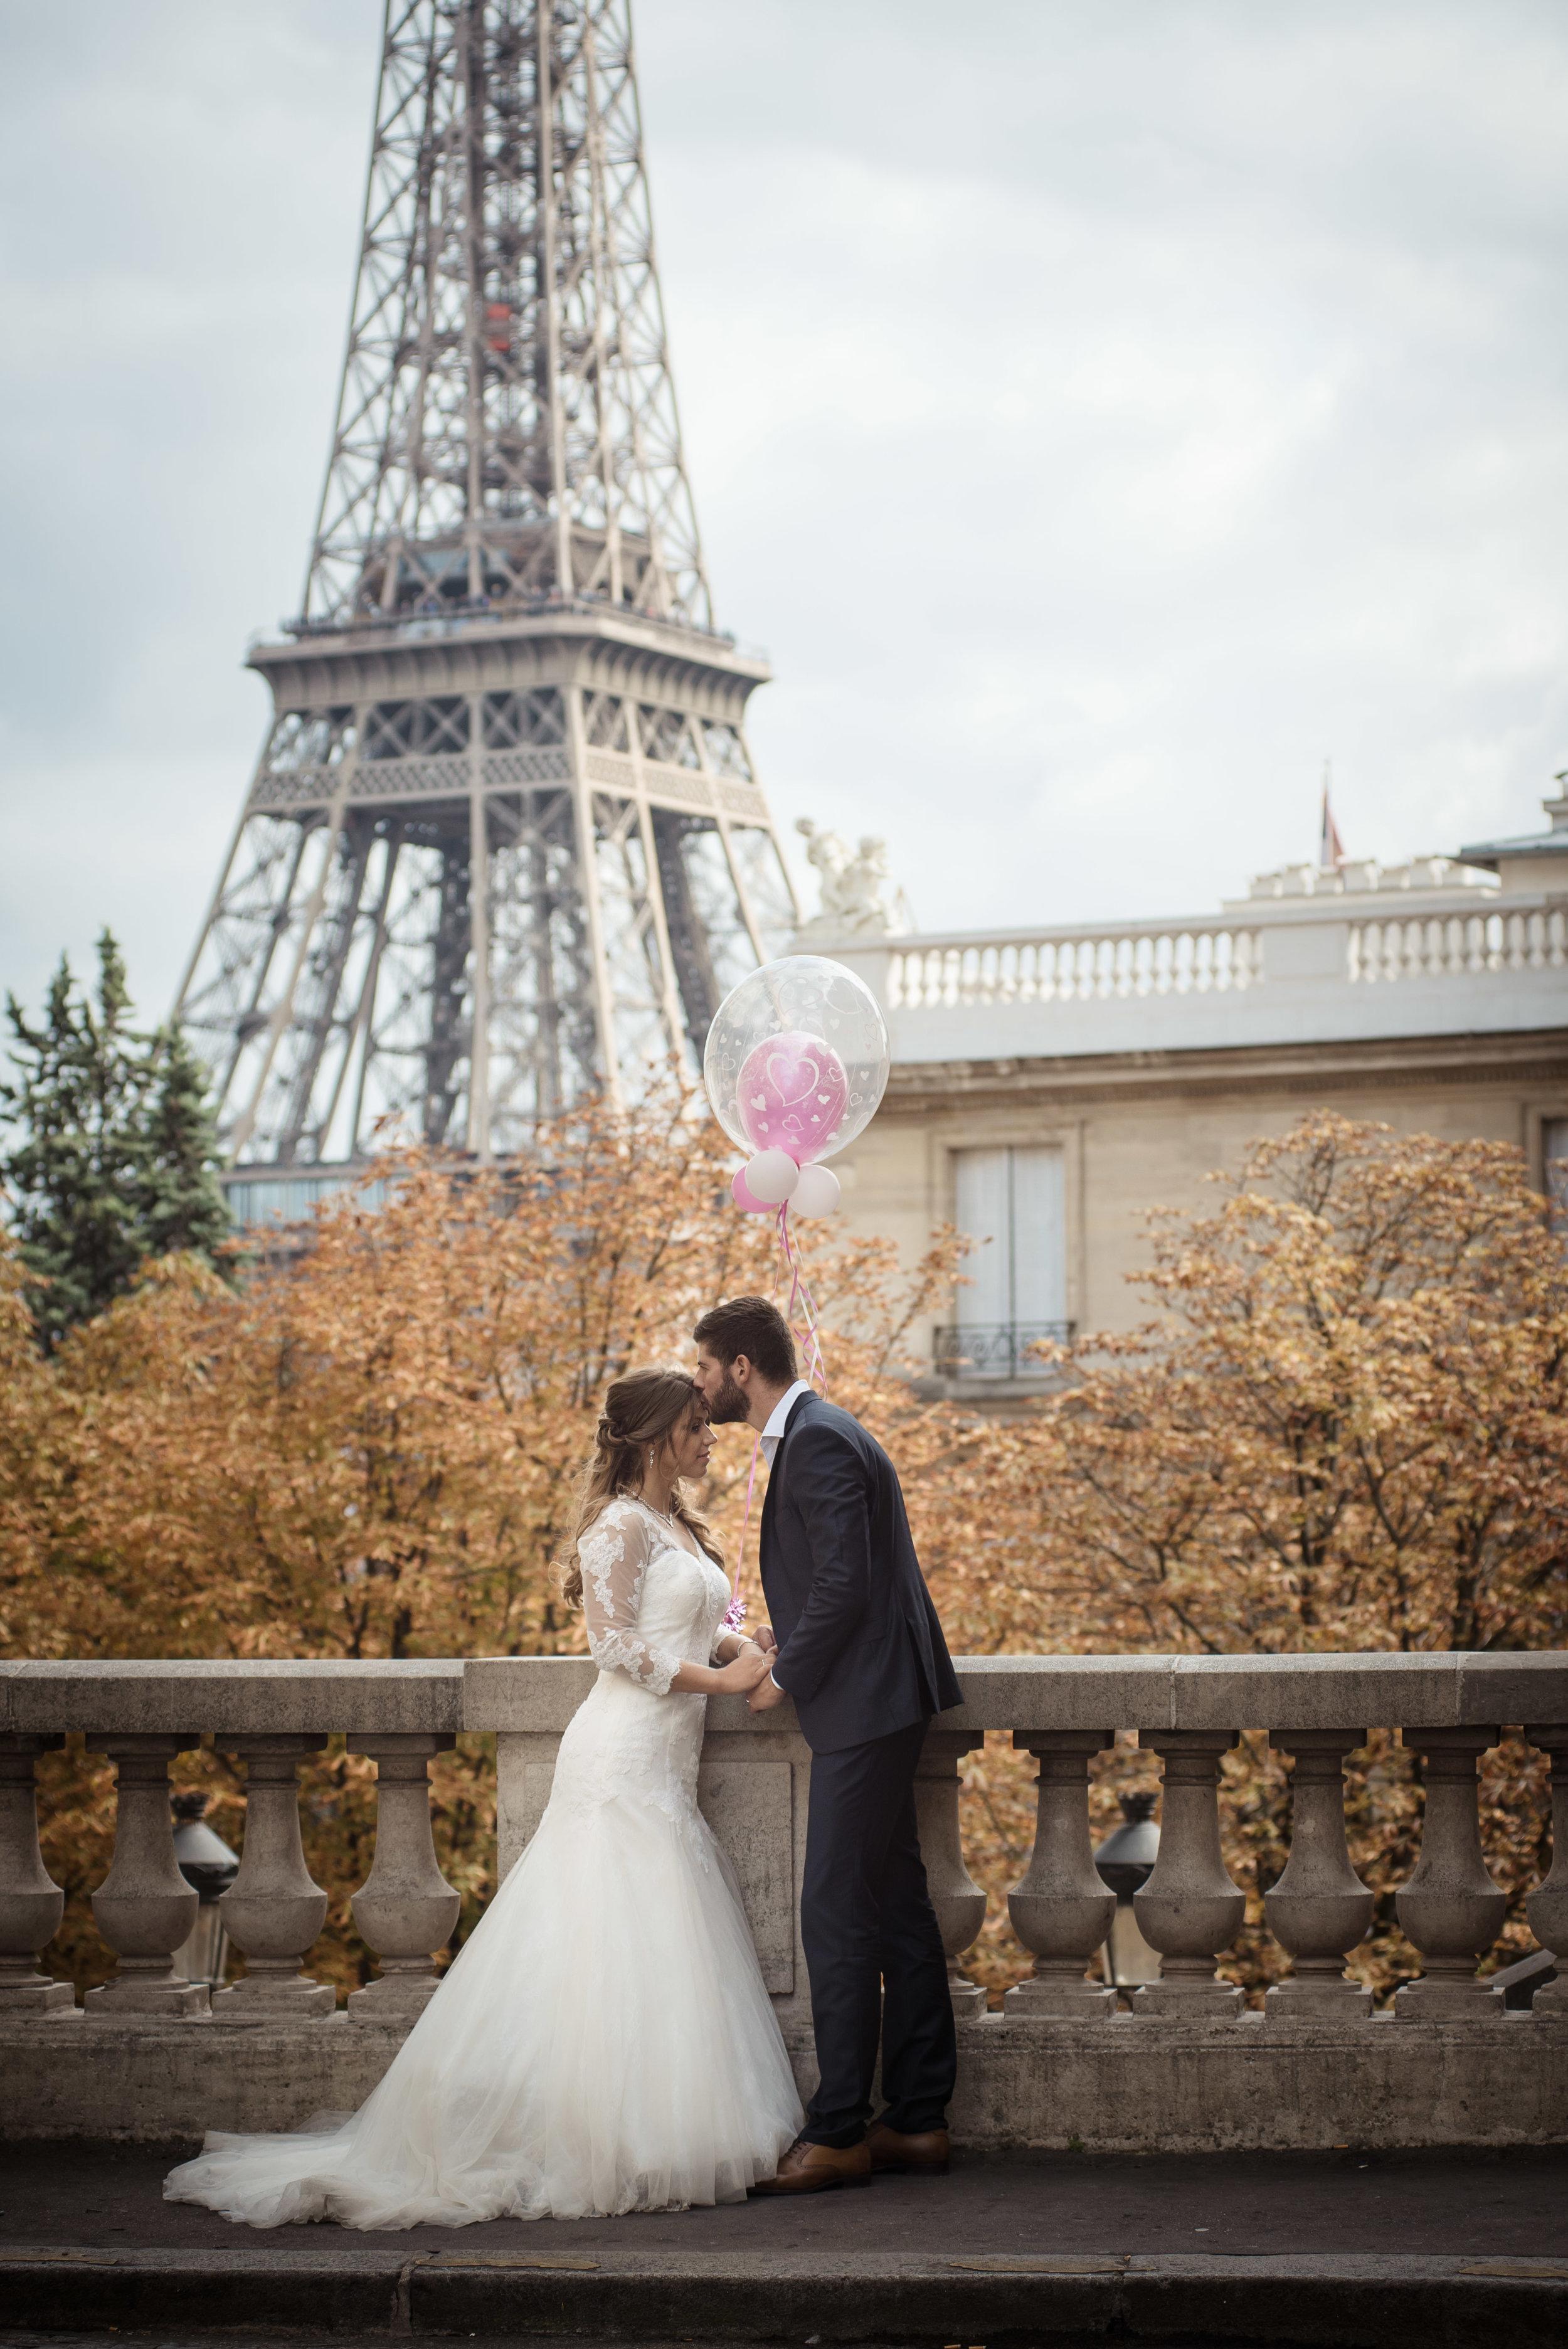 Amelie & Vincent - Photoshoot (4).jpg